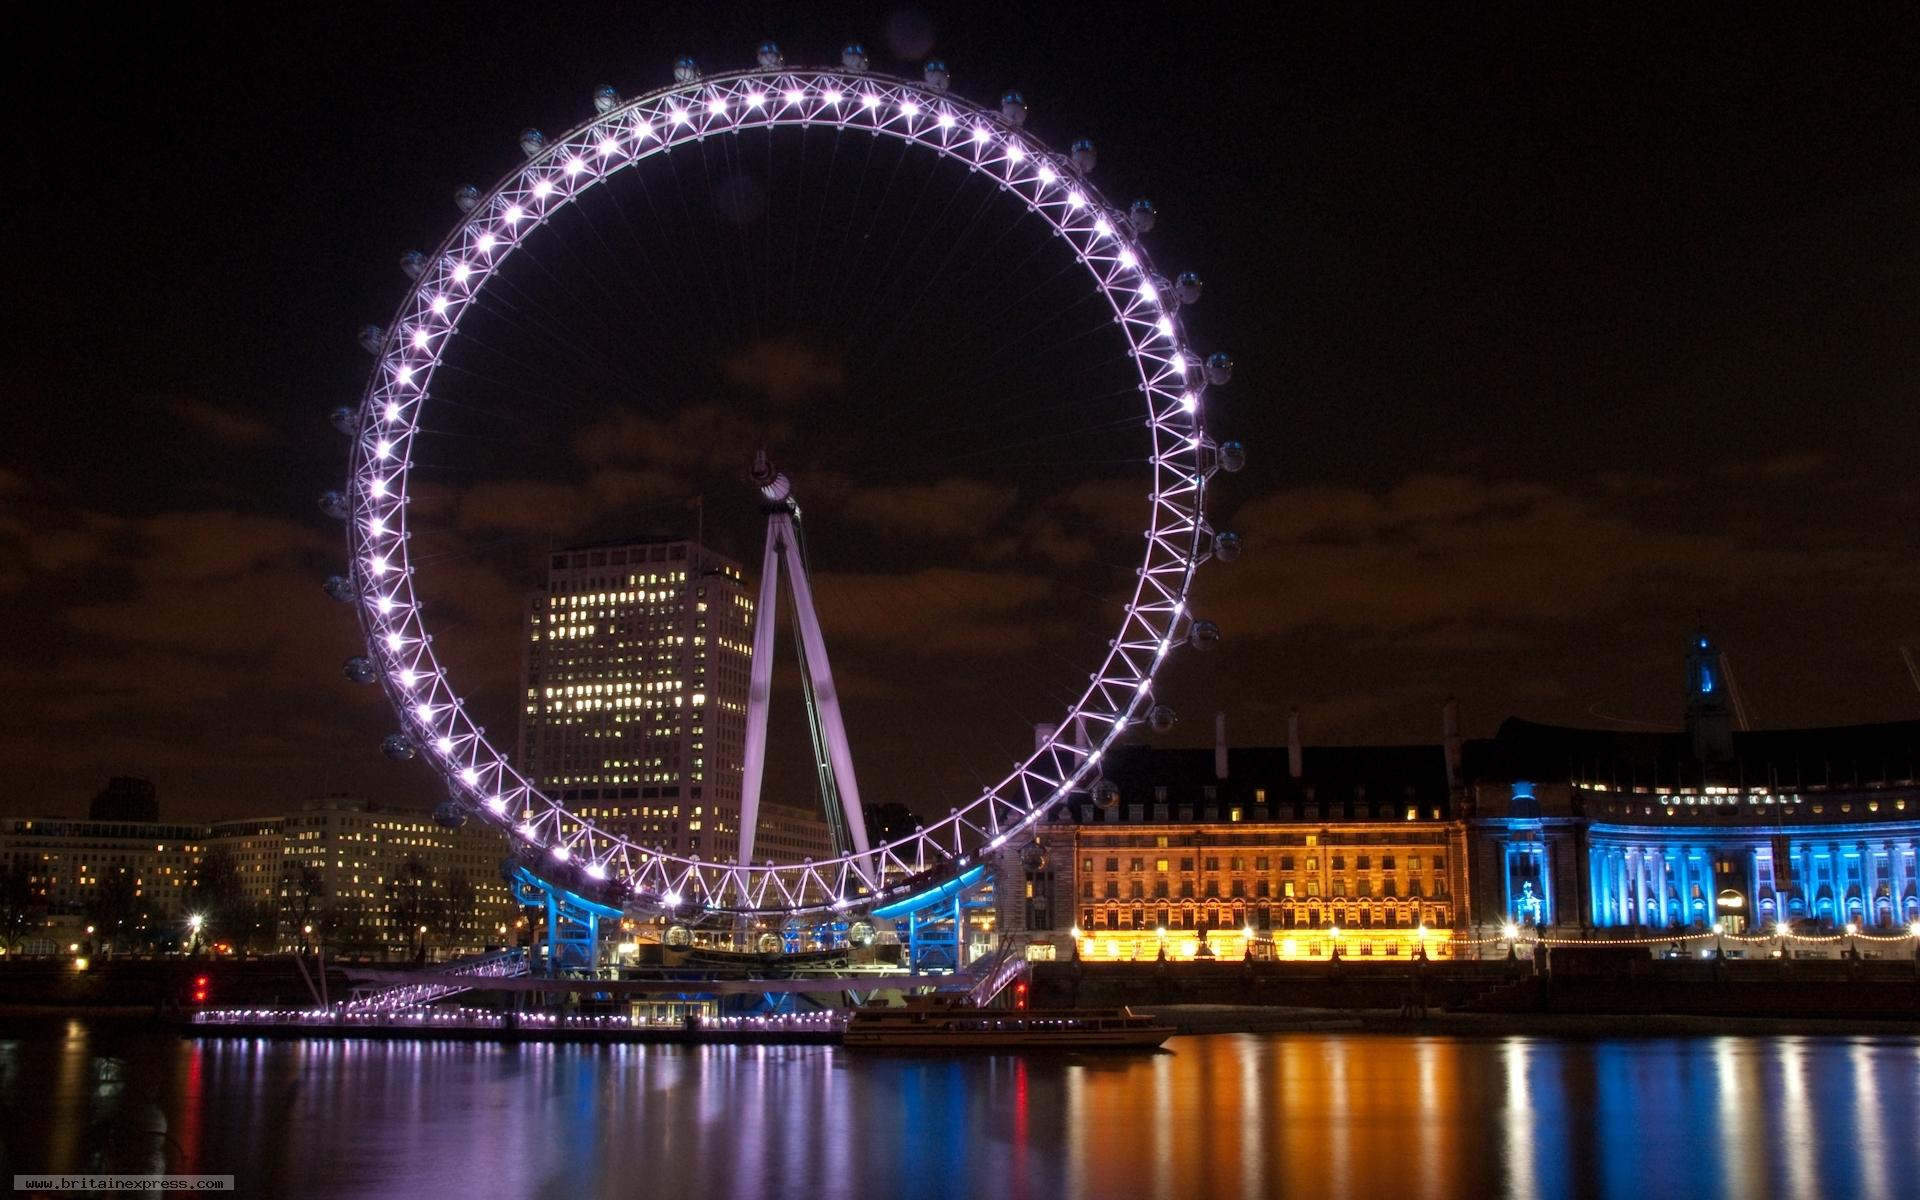 london eye by night -#main